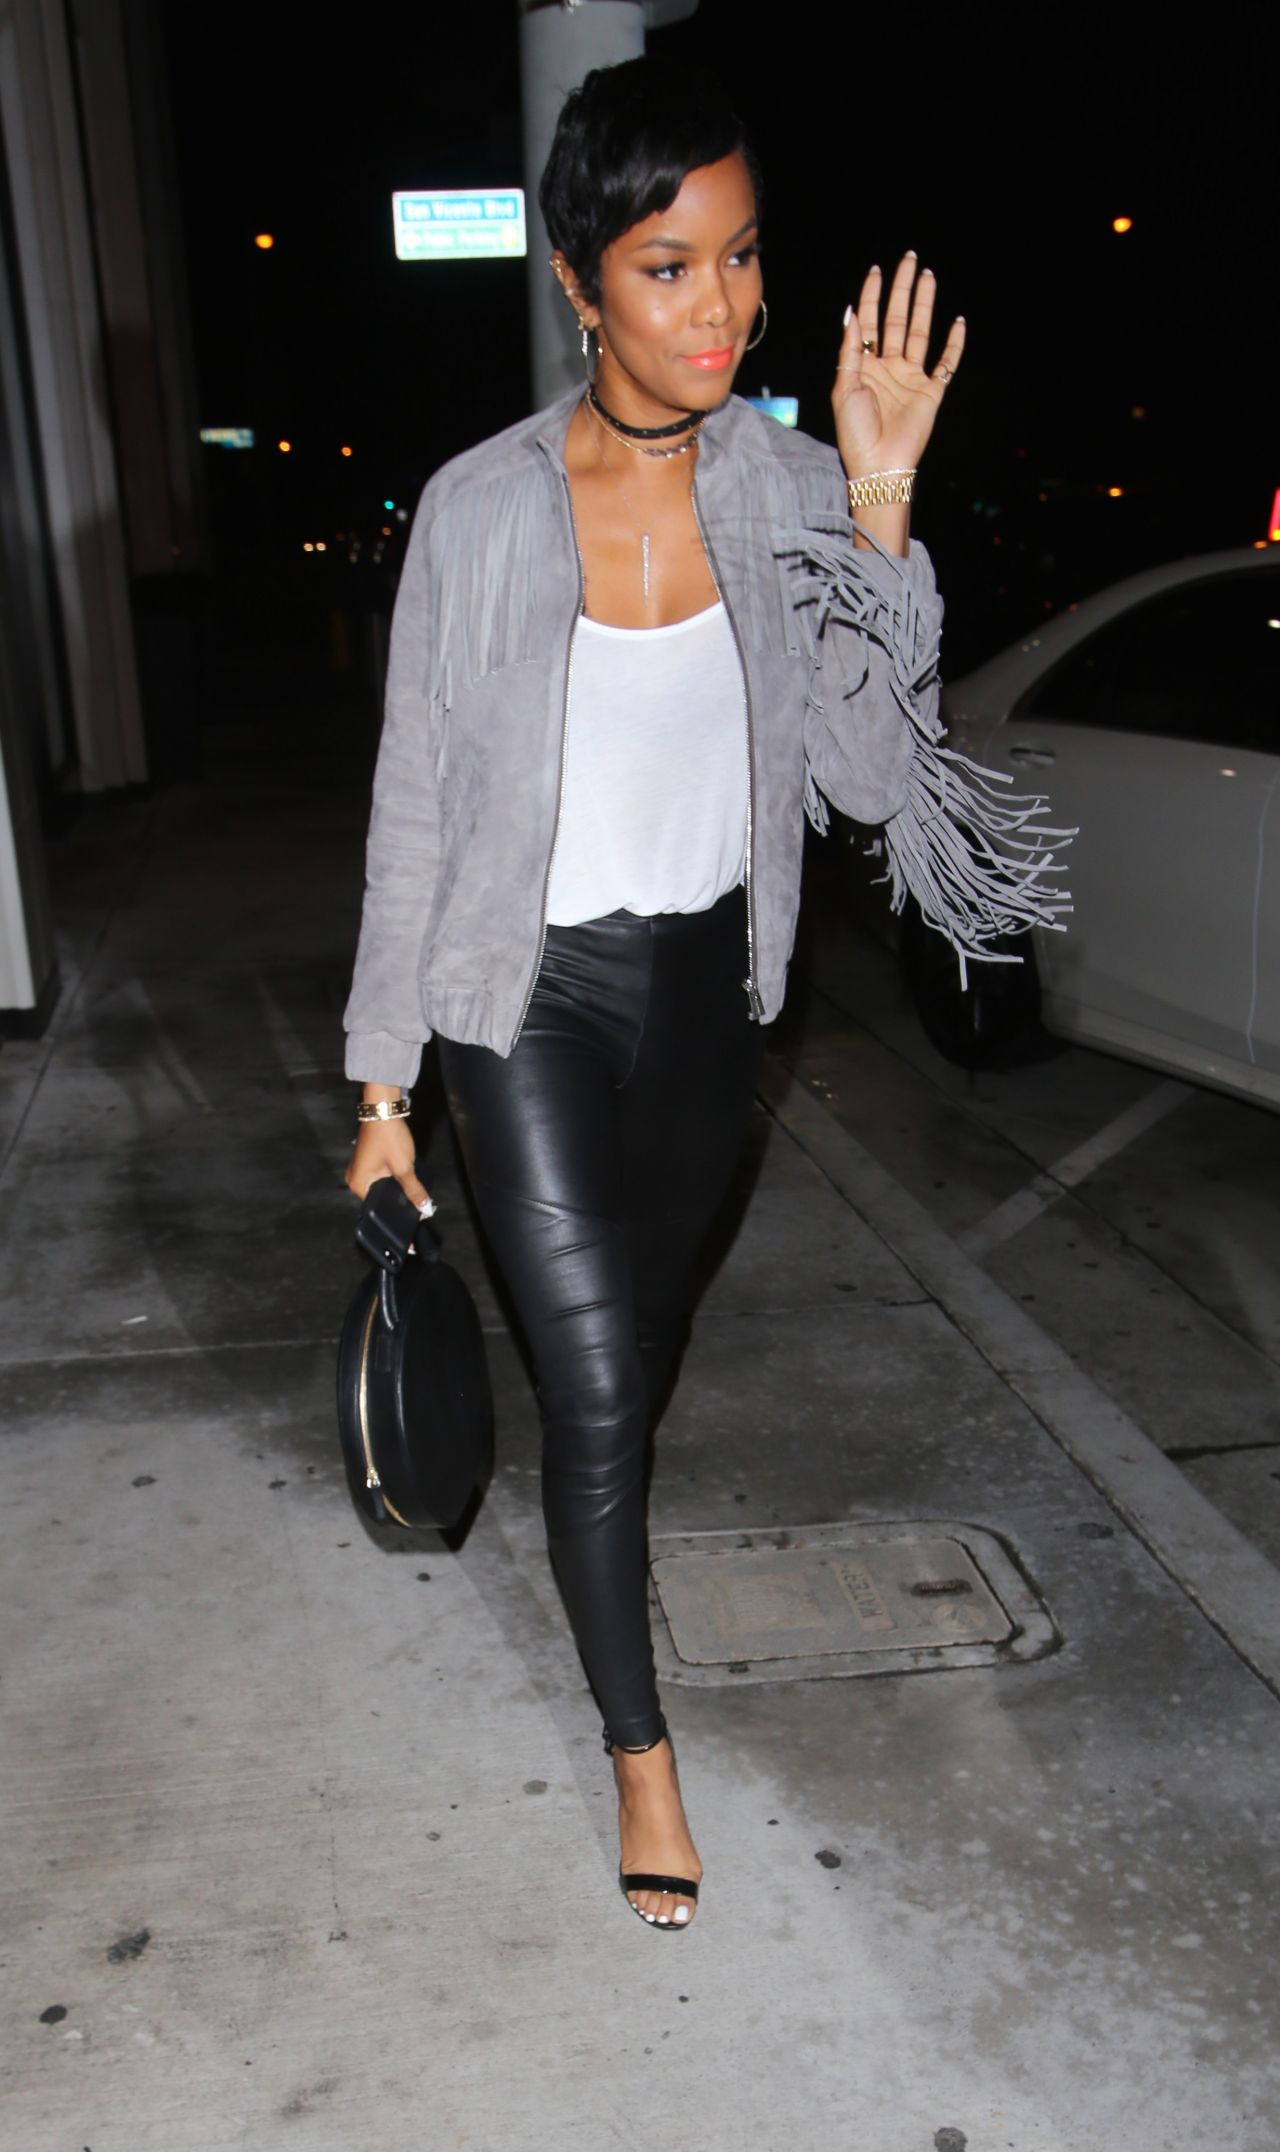 Letoya Luckett In Leather Catch La In West Hollywood 2